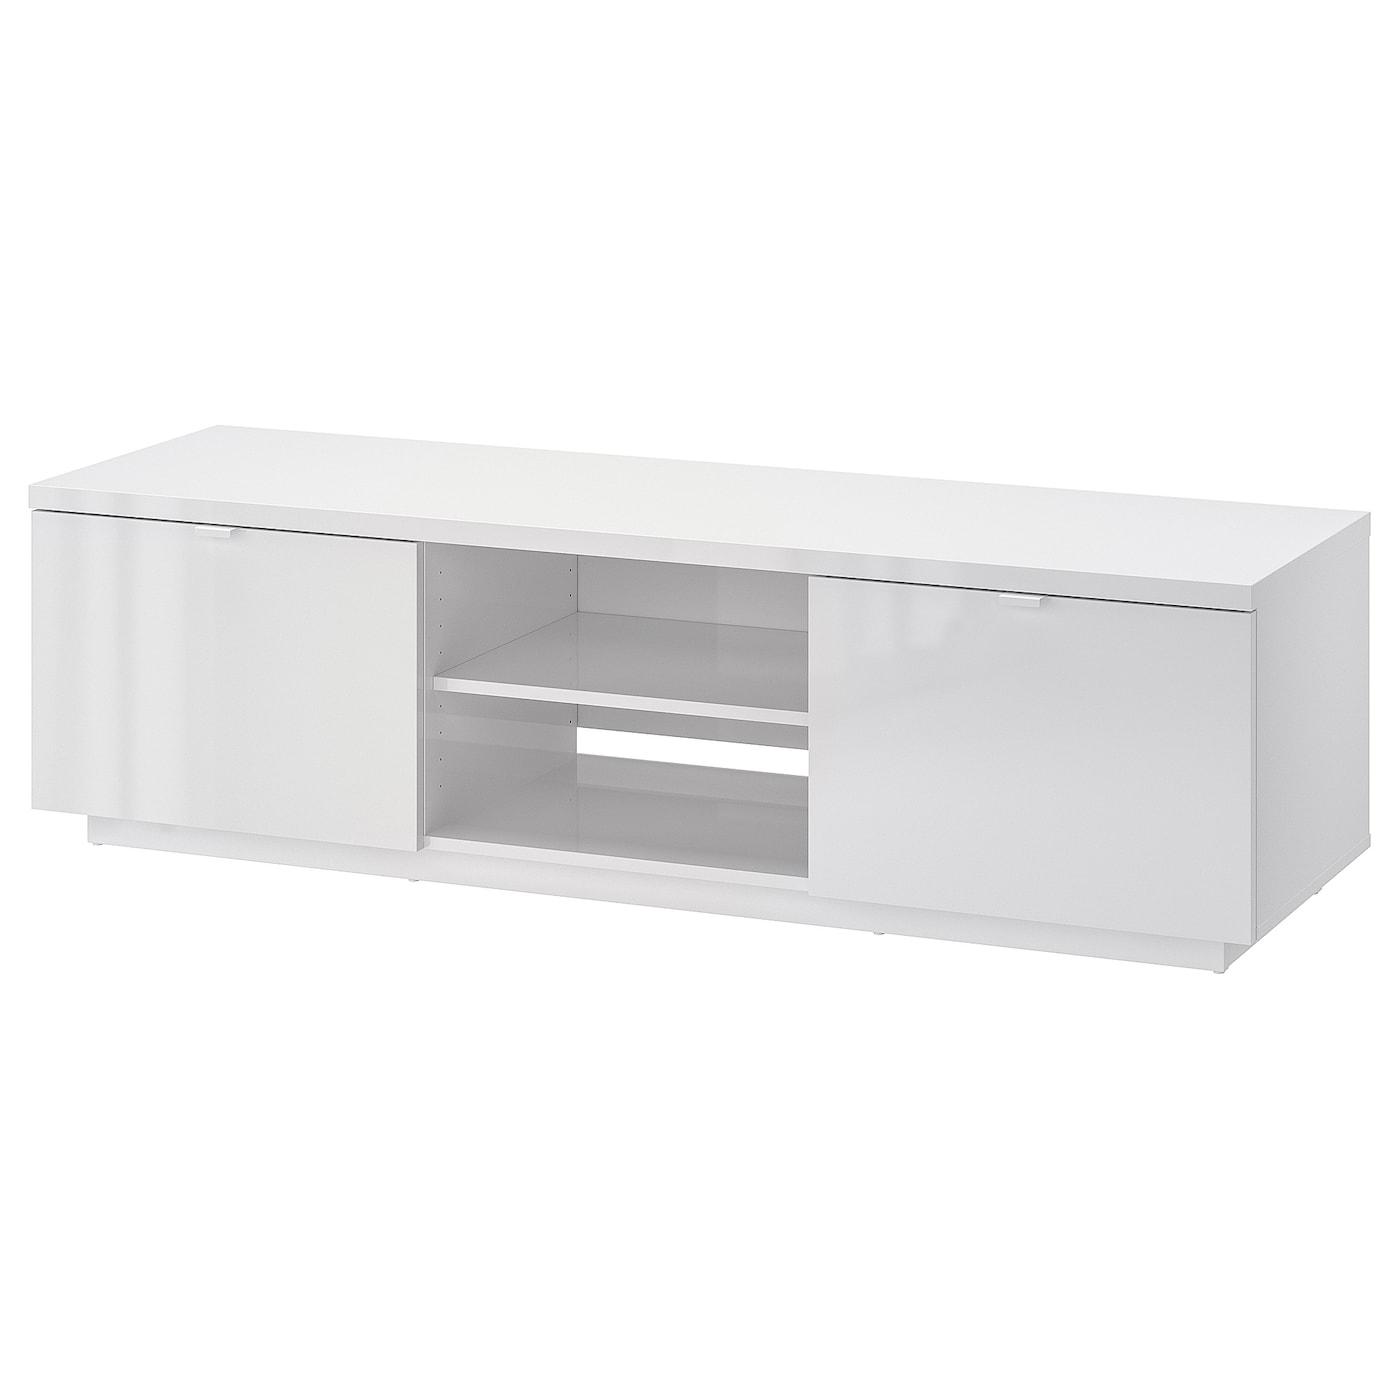 Uitgelezene BYÅS TV unit - IKEA IU-05